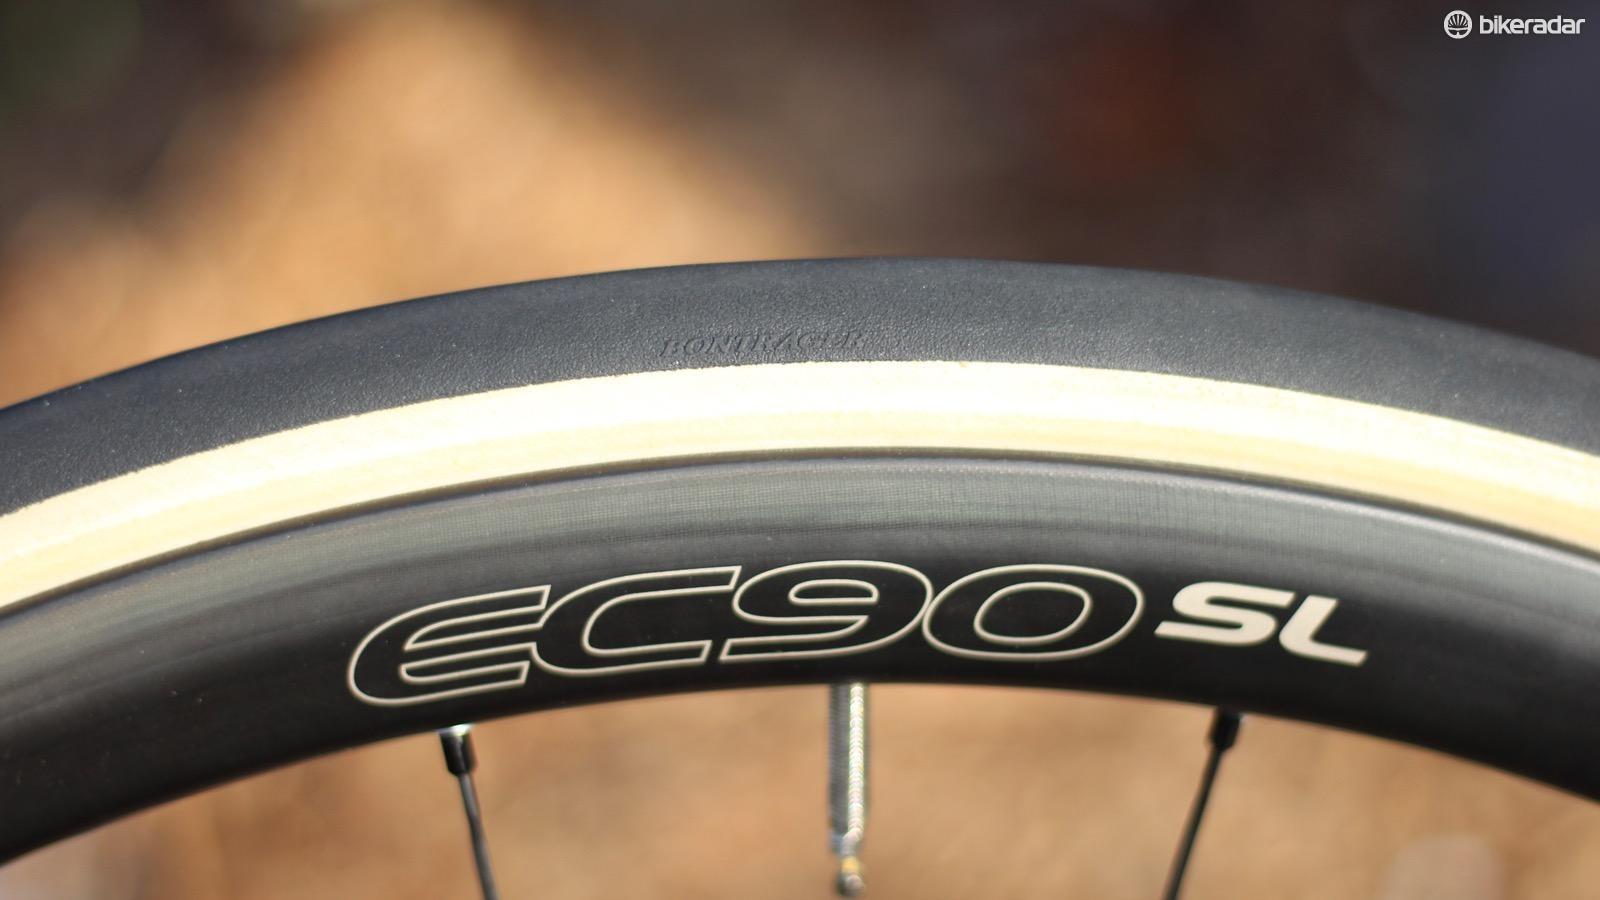 road-tire-test-7-1486070698667-6dyy3vlcfaxa-d51cfe1